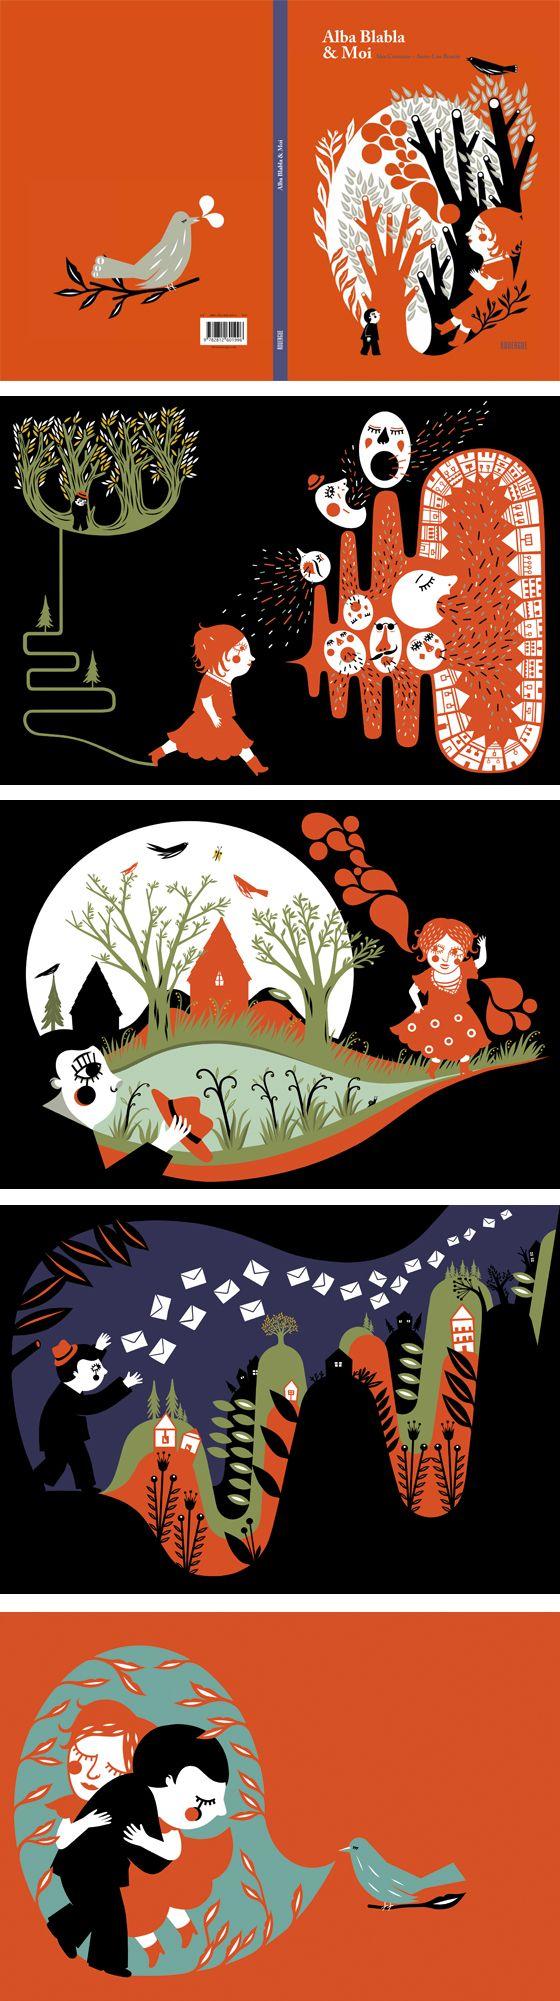 by Anne-Lise Boutin #ContameUnCuento #serigrafiar #genialidad